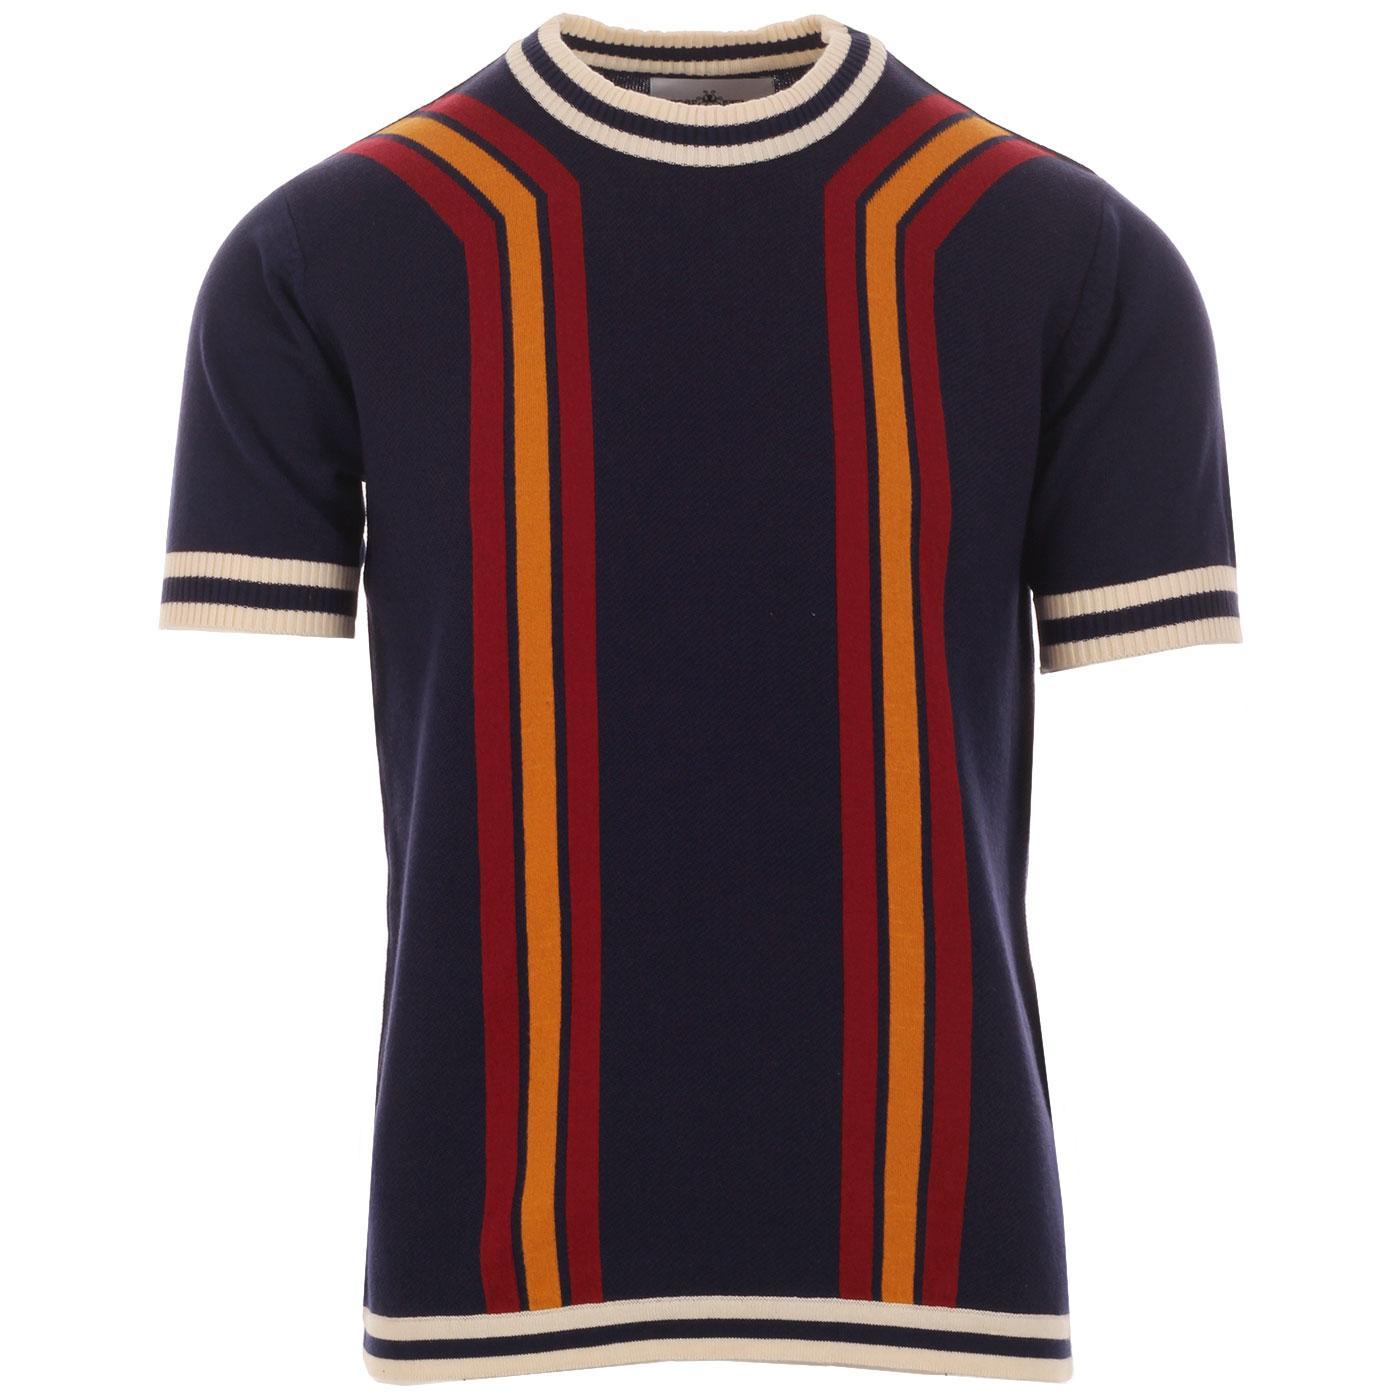 Madcap England Modernista Retro 1970s Waffle Texture Contoured Stripe Knit Tee in Eclipse